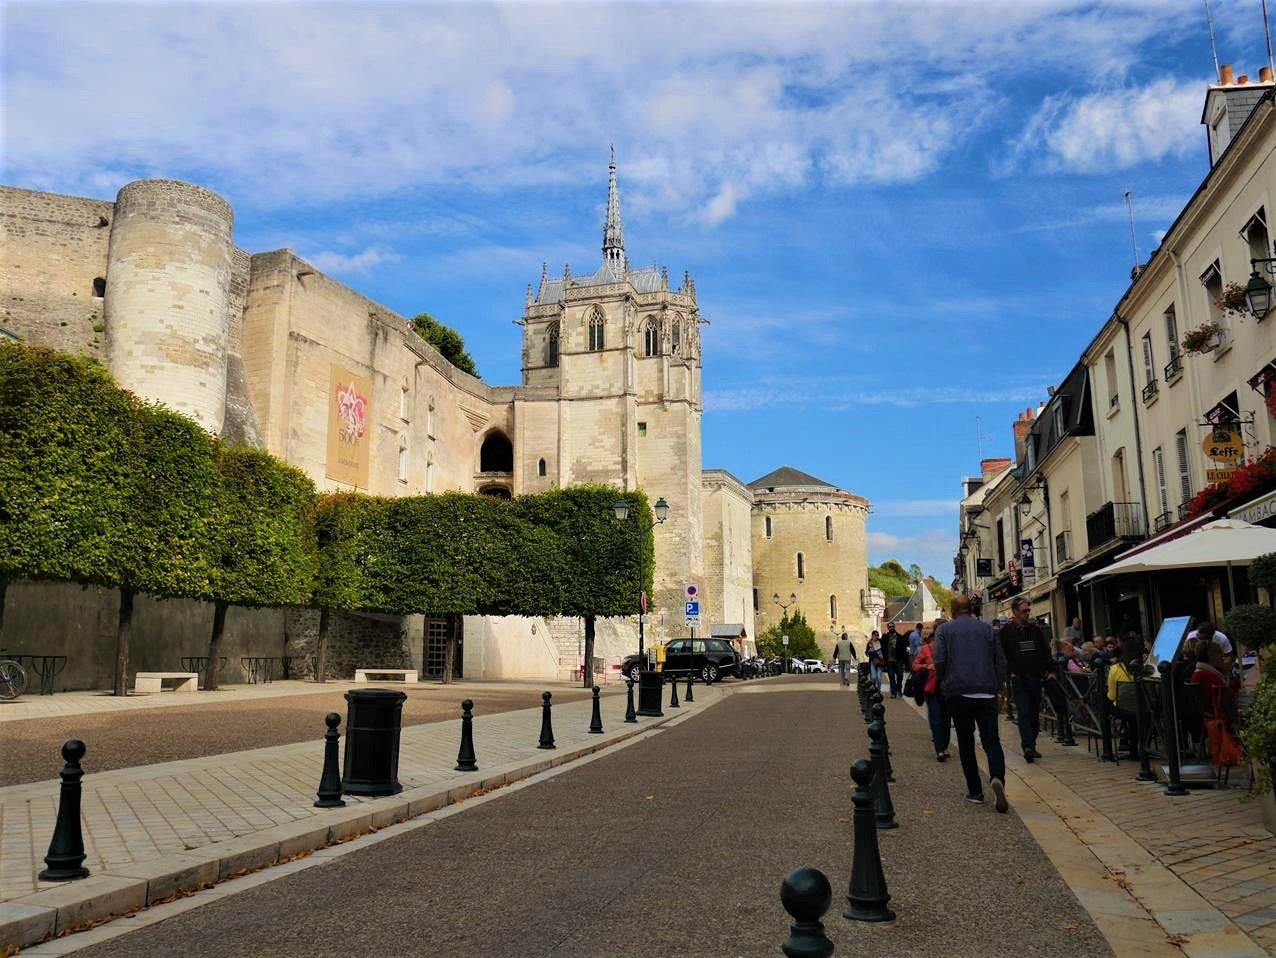 昂布瓦斯(Amboise)